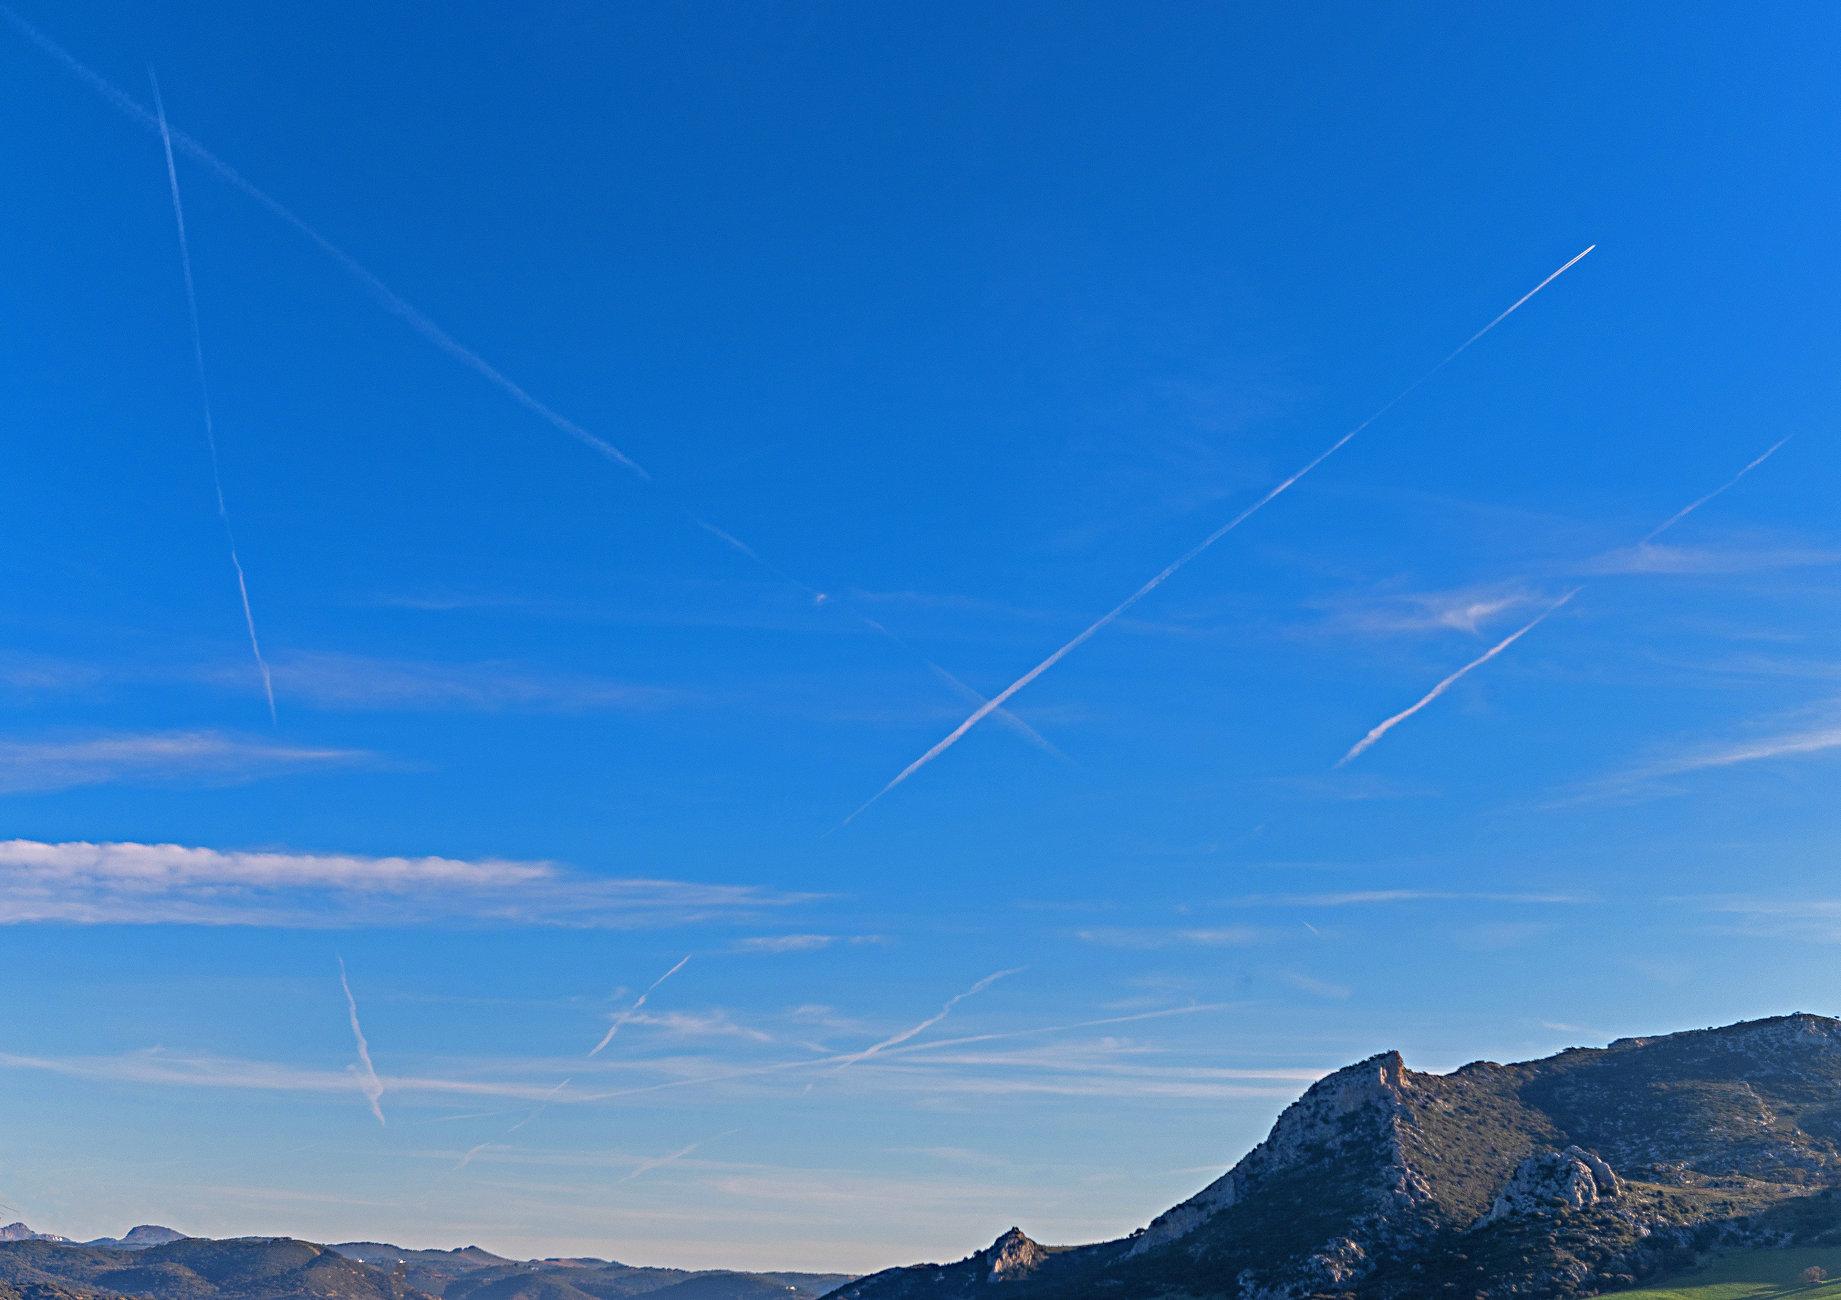 Blue Spanish Skies, With Apologies To Al Martino!